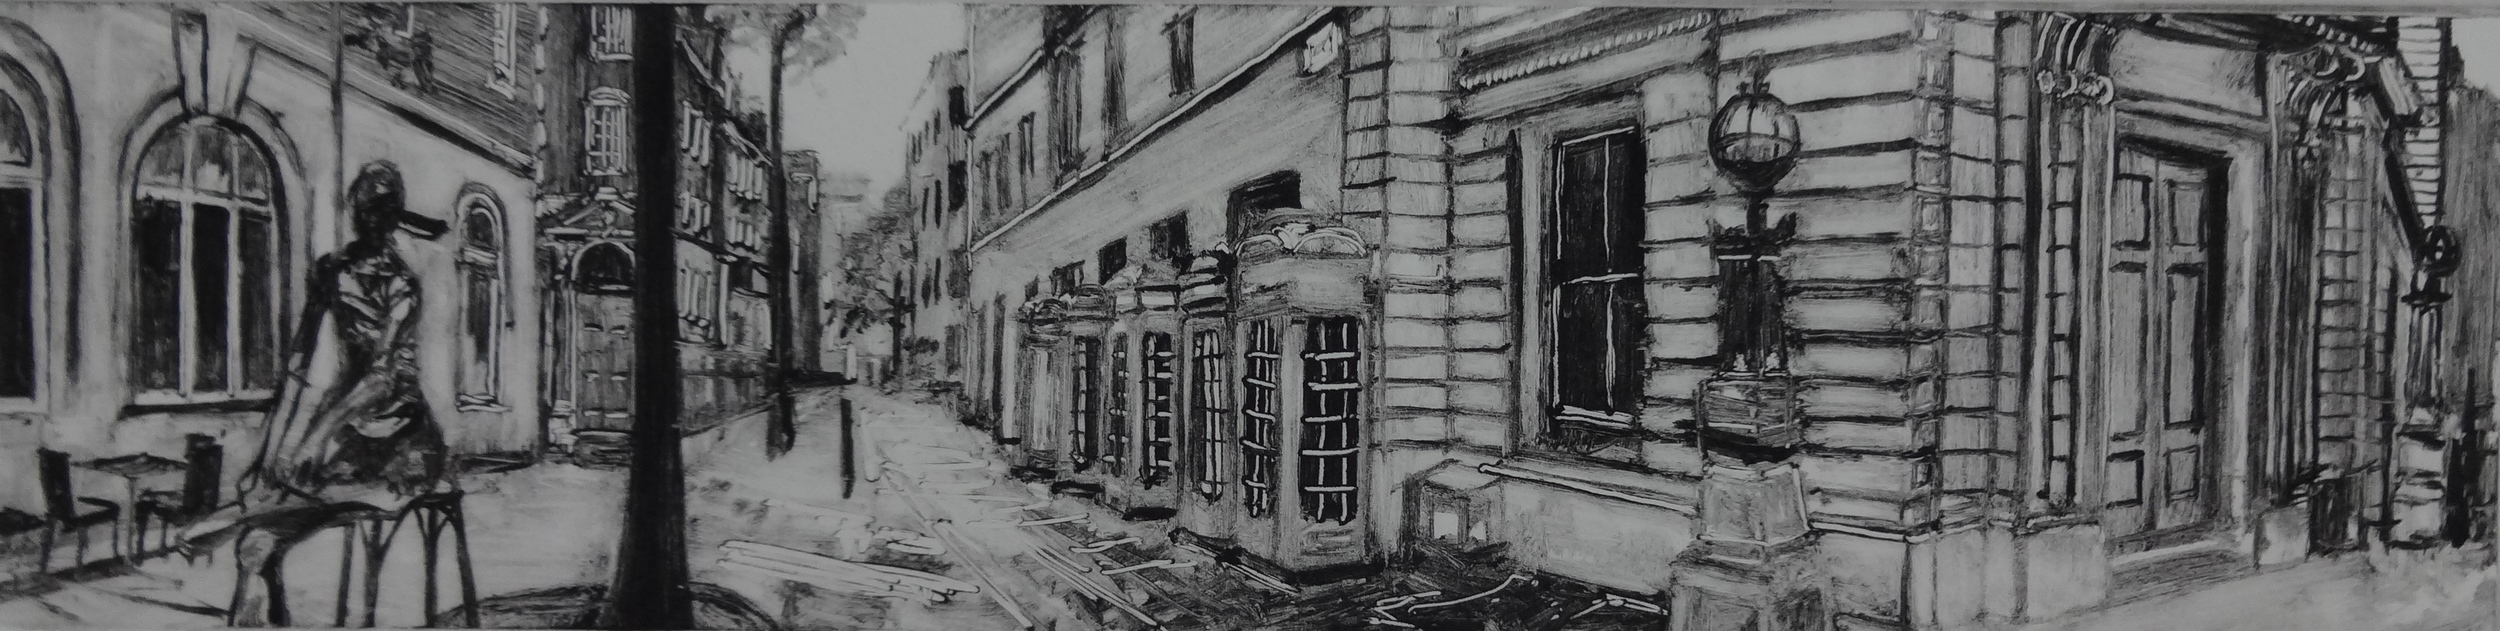 Monotype Broad Court London 7.5 x 29.5 cm.JPG